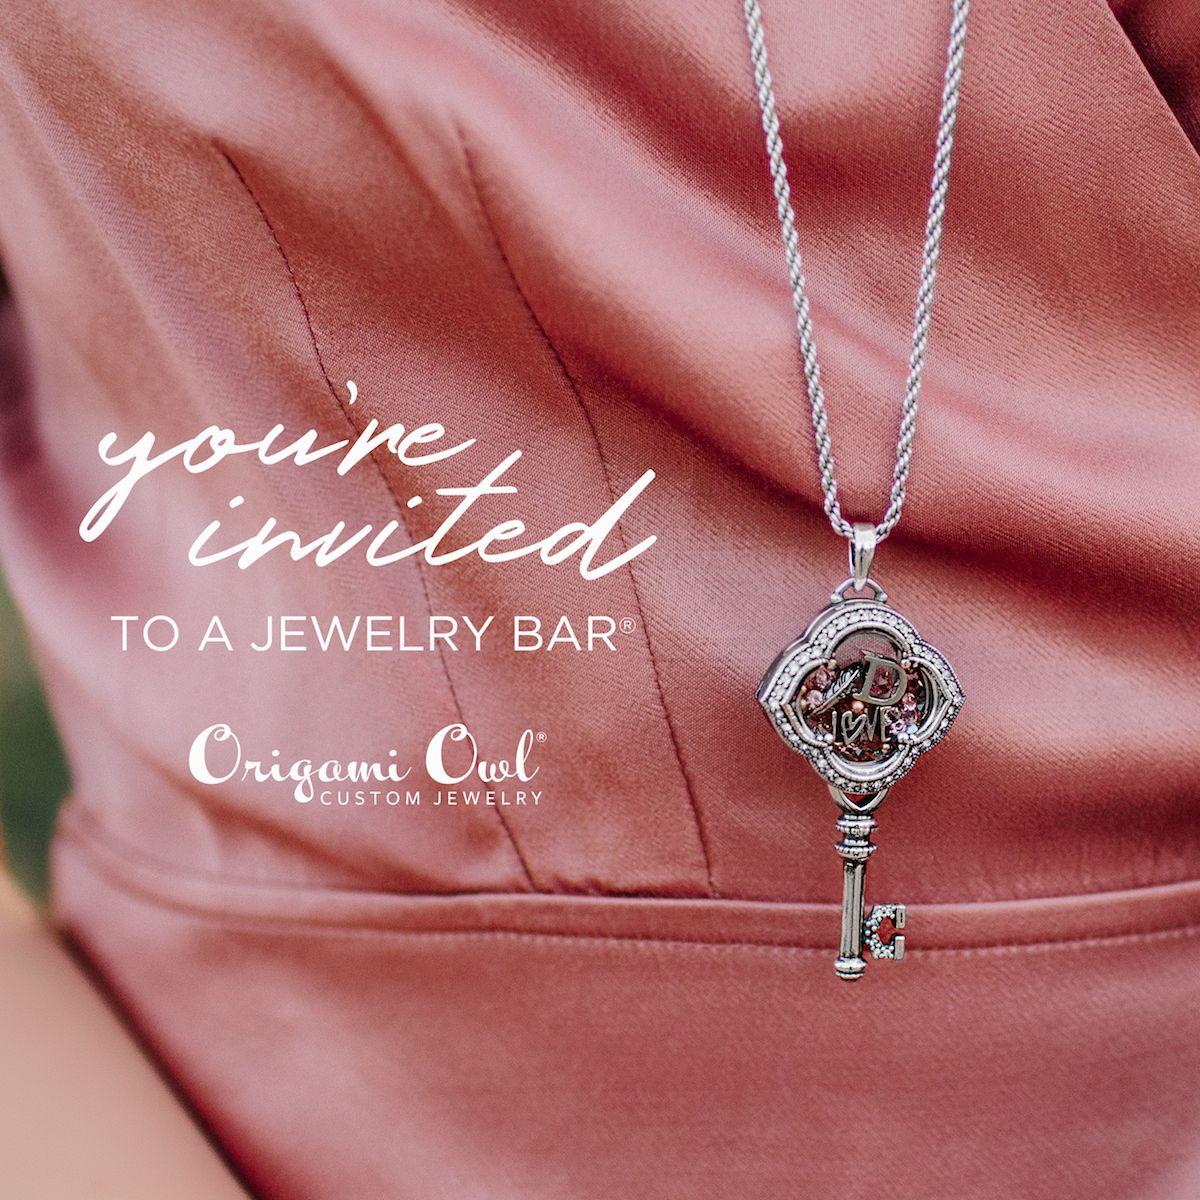 You Re Invited In 2020 Origami Owl Origami Owl Jewelry Origami Owl Custom Jewelry